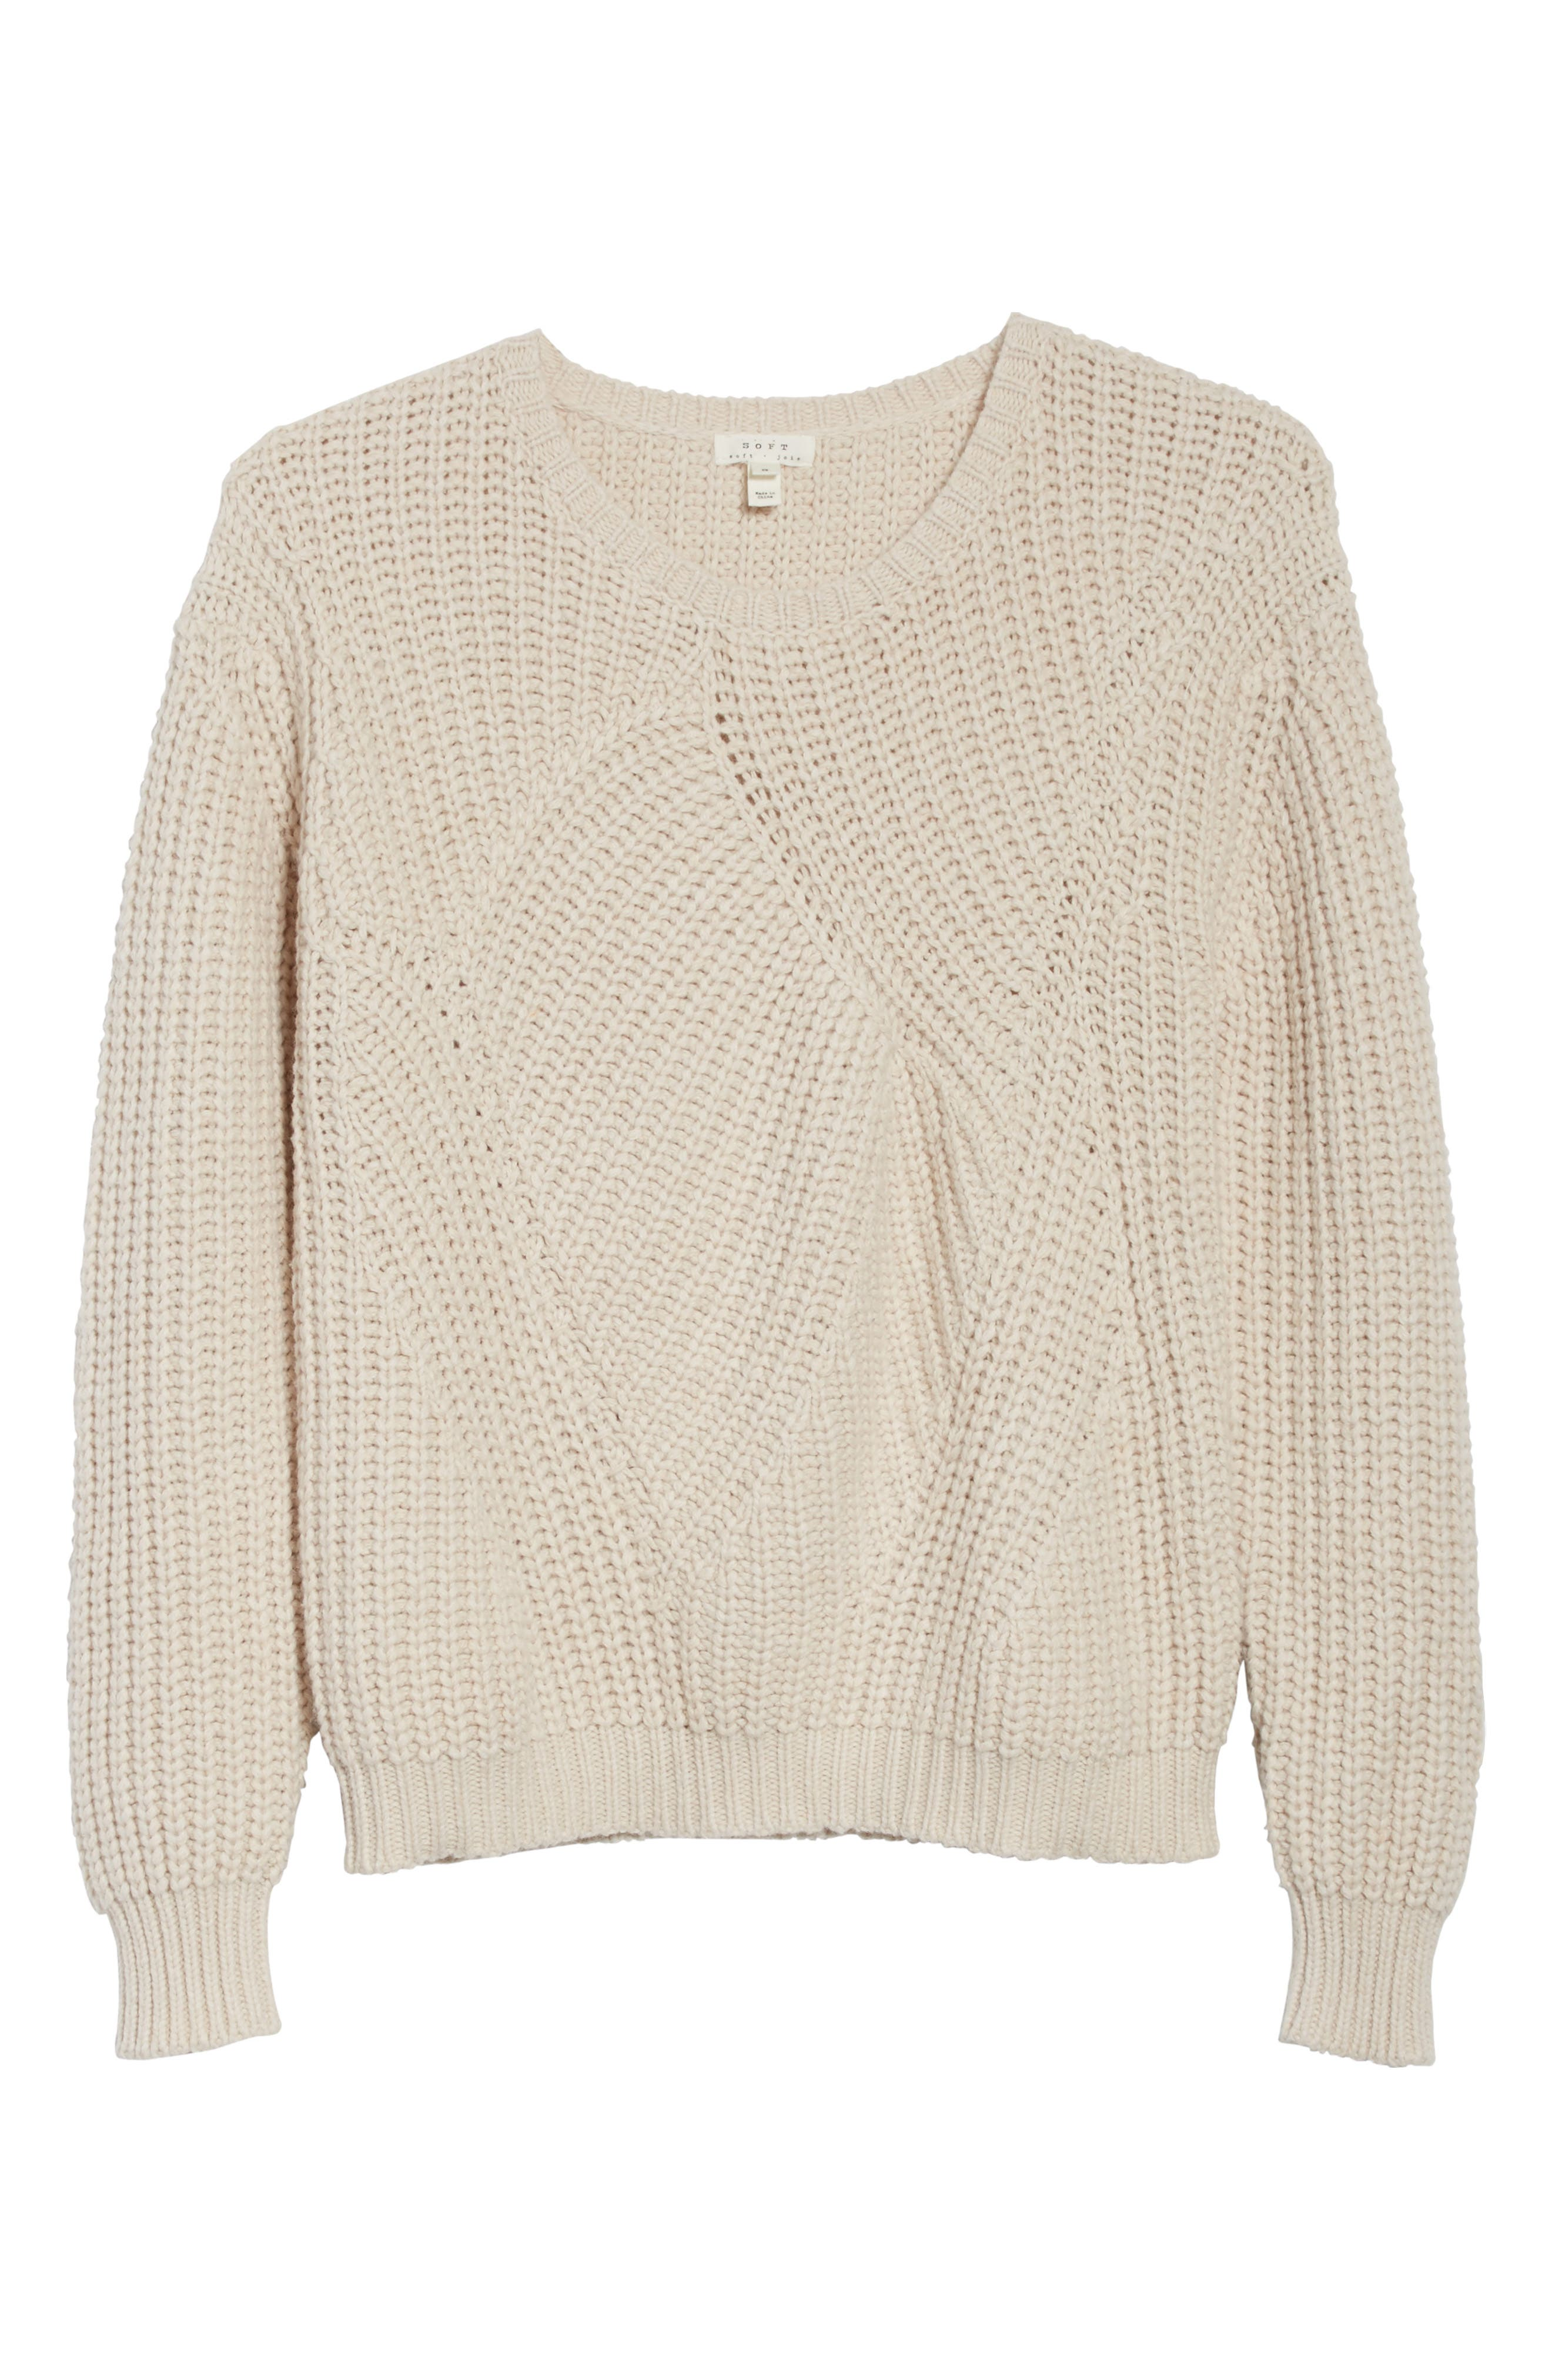 Balenne Sweater,                             Alternate thumbnail 6, color,                             277